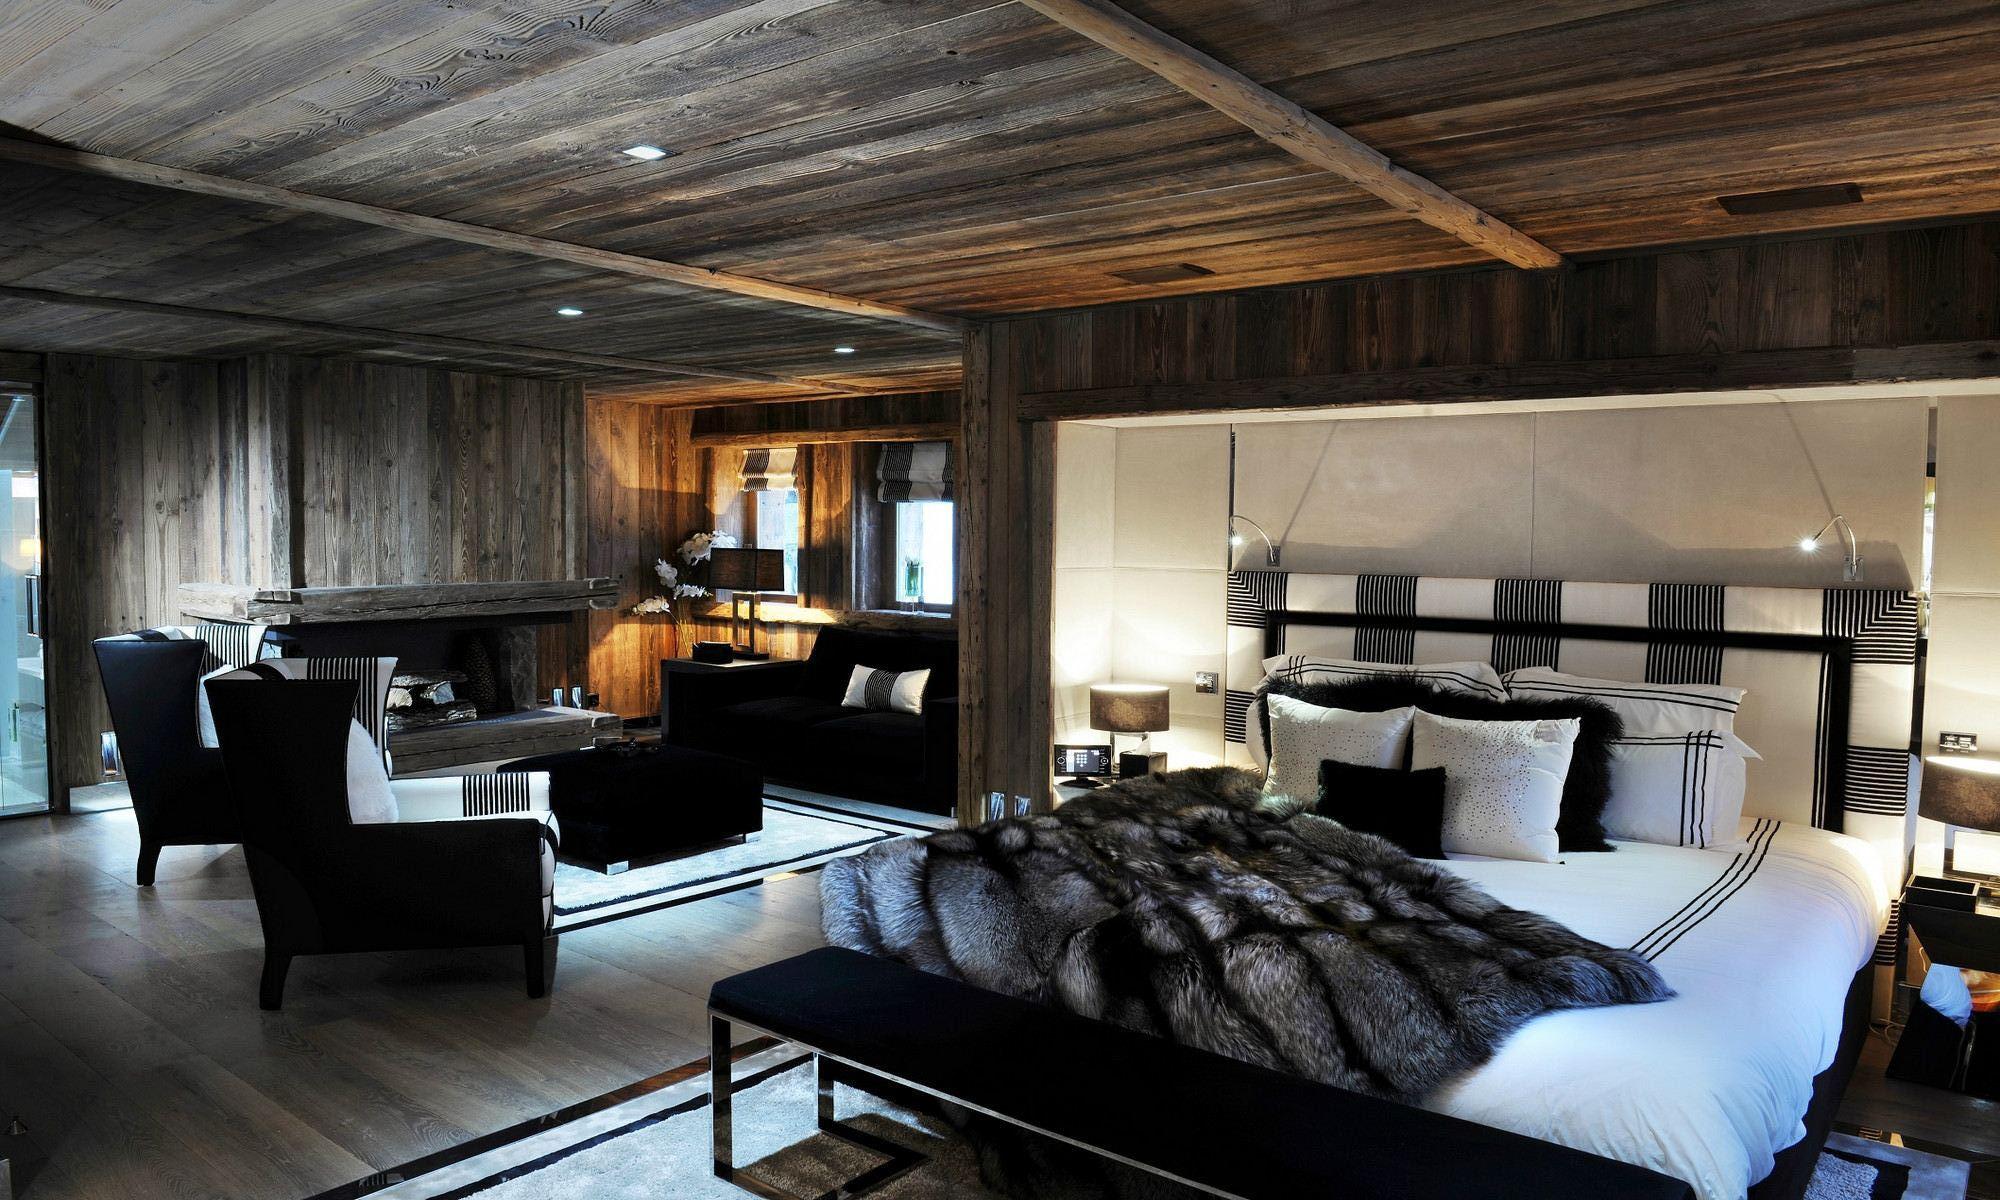 Single Family Home for Sale at Megève Luxury Chalet Cocon Megeve, Rhone-Alpes 74120 France